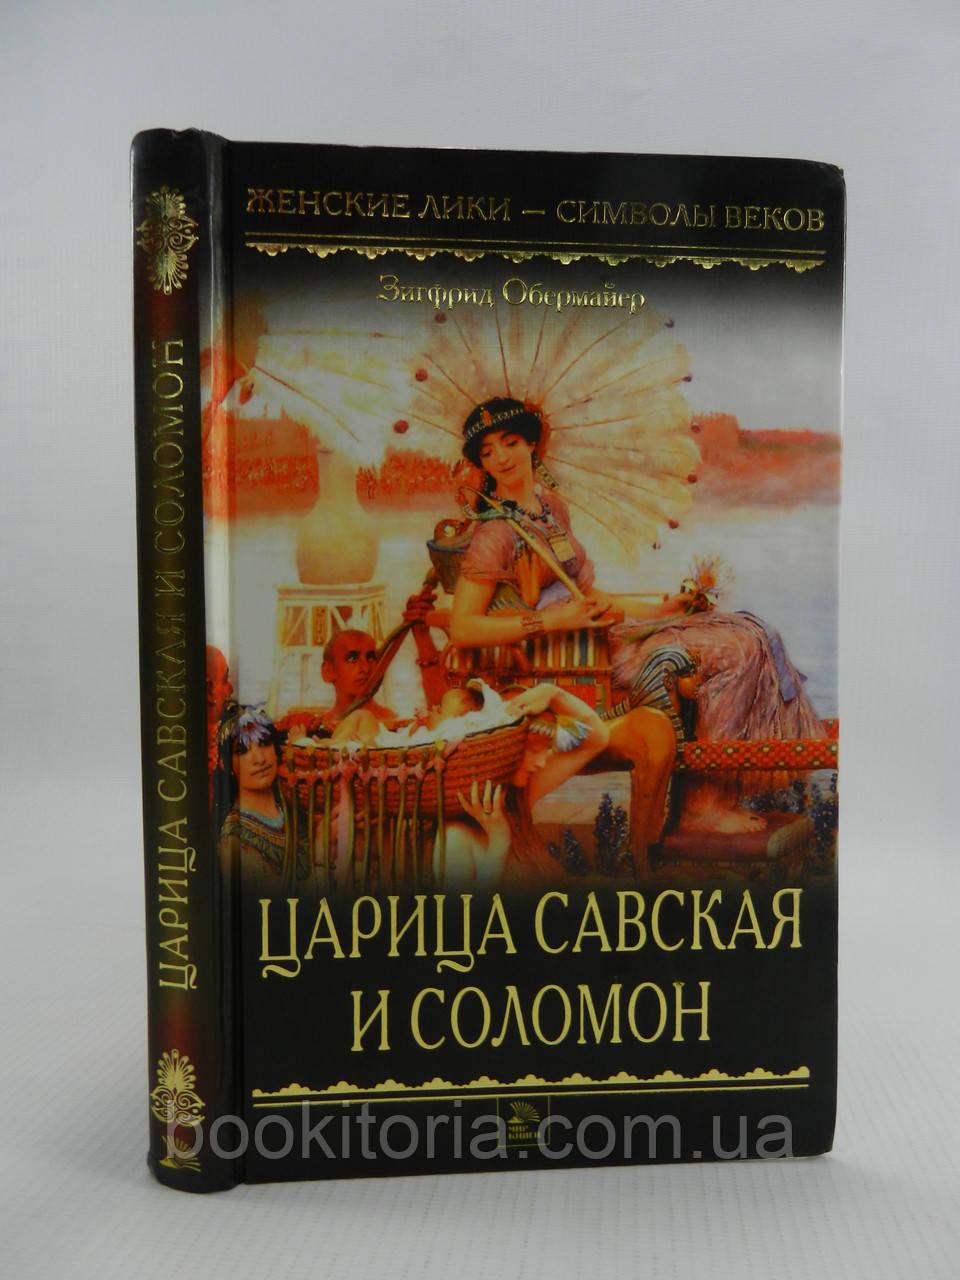 Обермайер З. Царица Савская и Соломон (б/у).